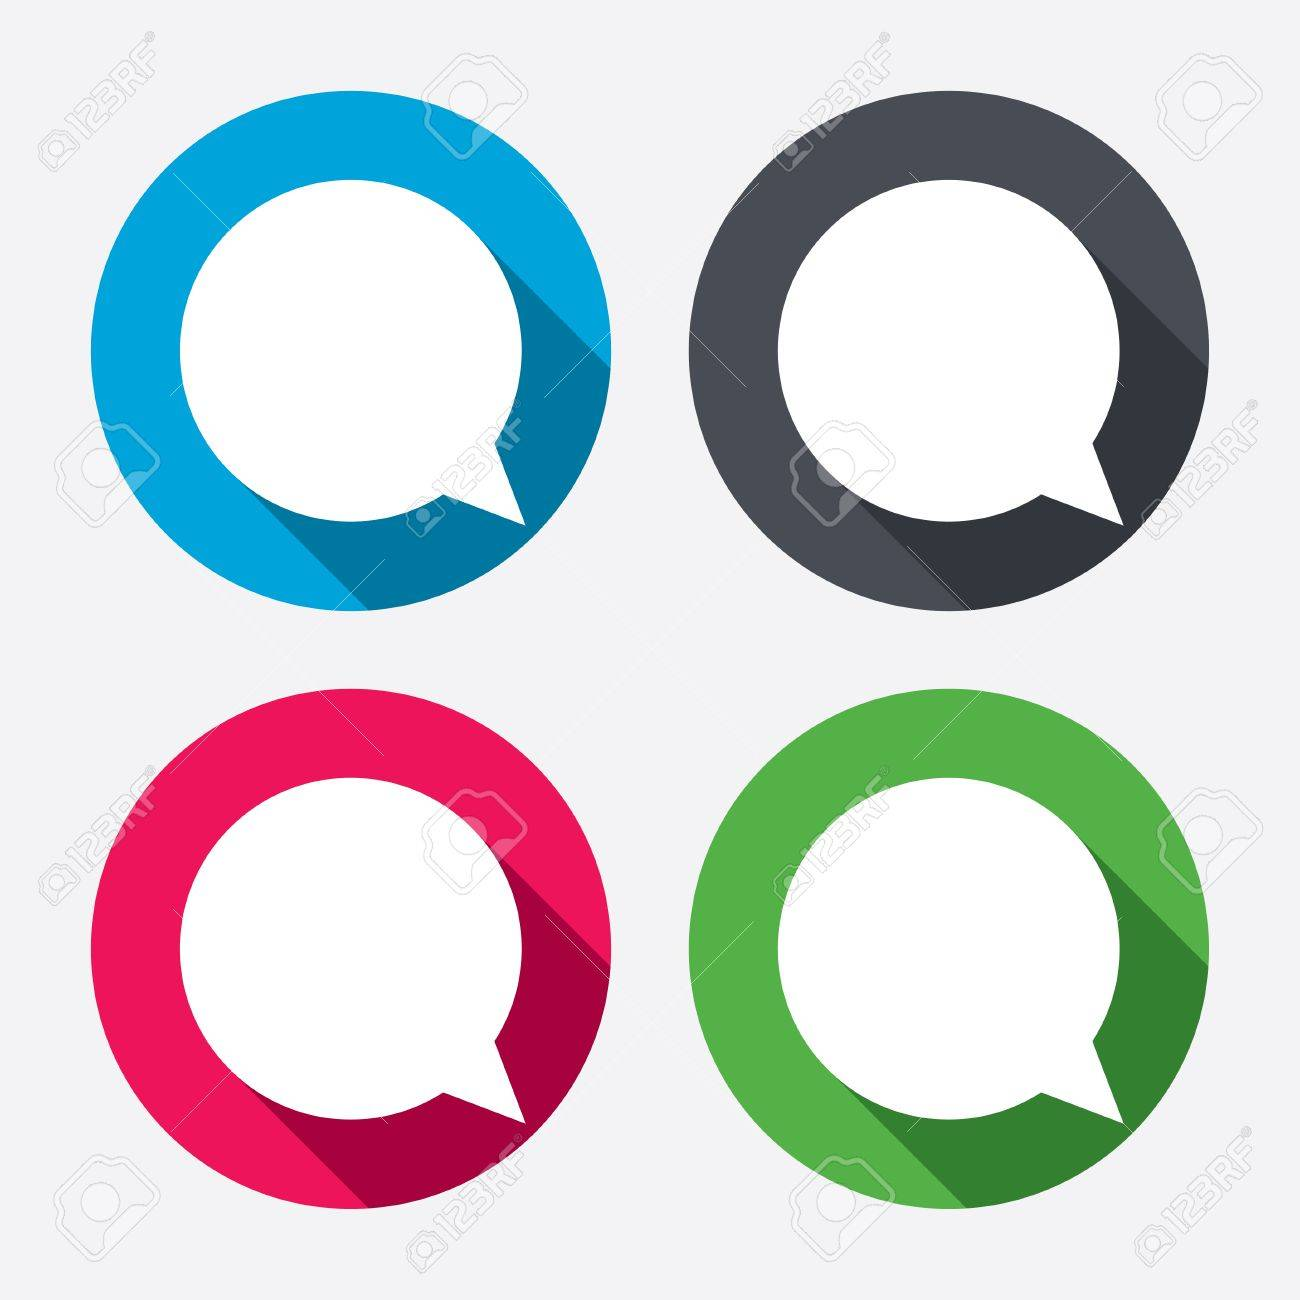 chat sign icon speech bubble symbol communication chat bubbles